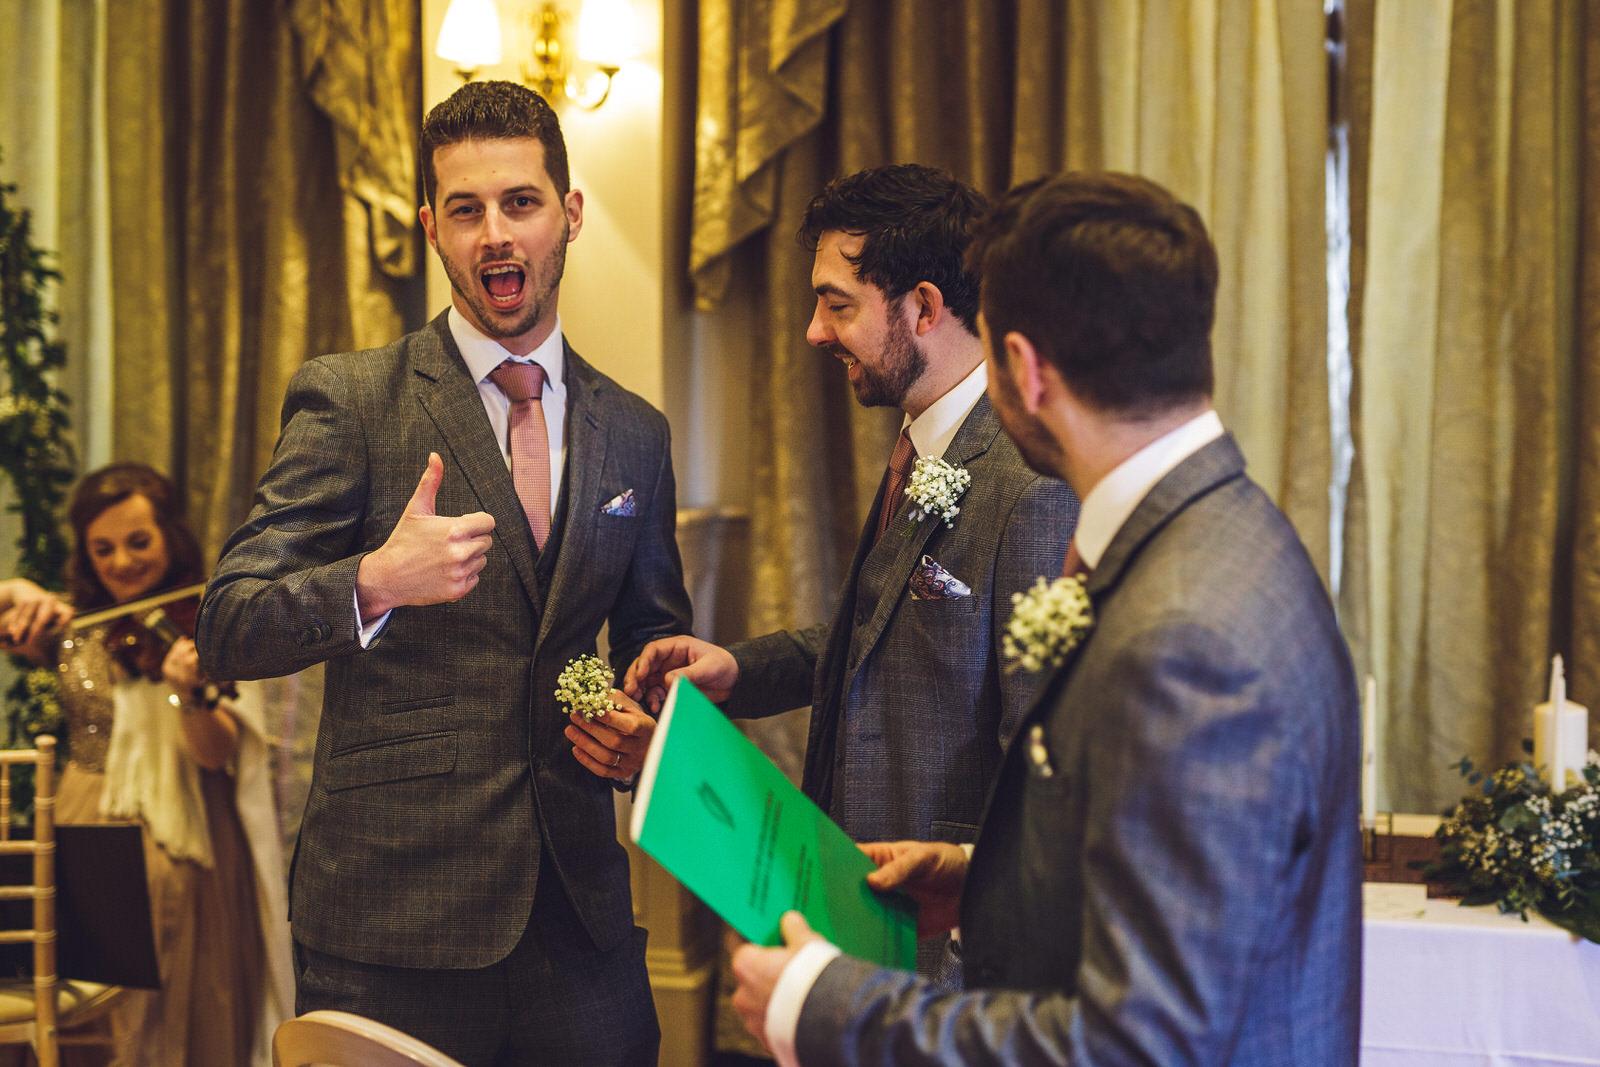 Roger-kenny-wedding-photographer-greystones-wicklow-dublin_010.jpg